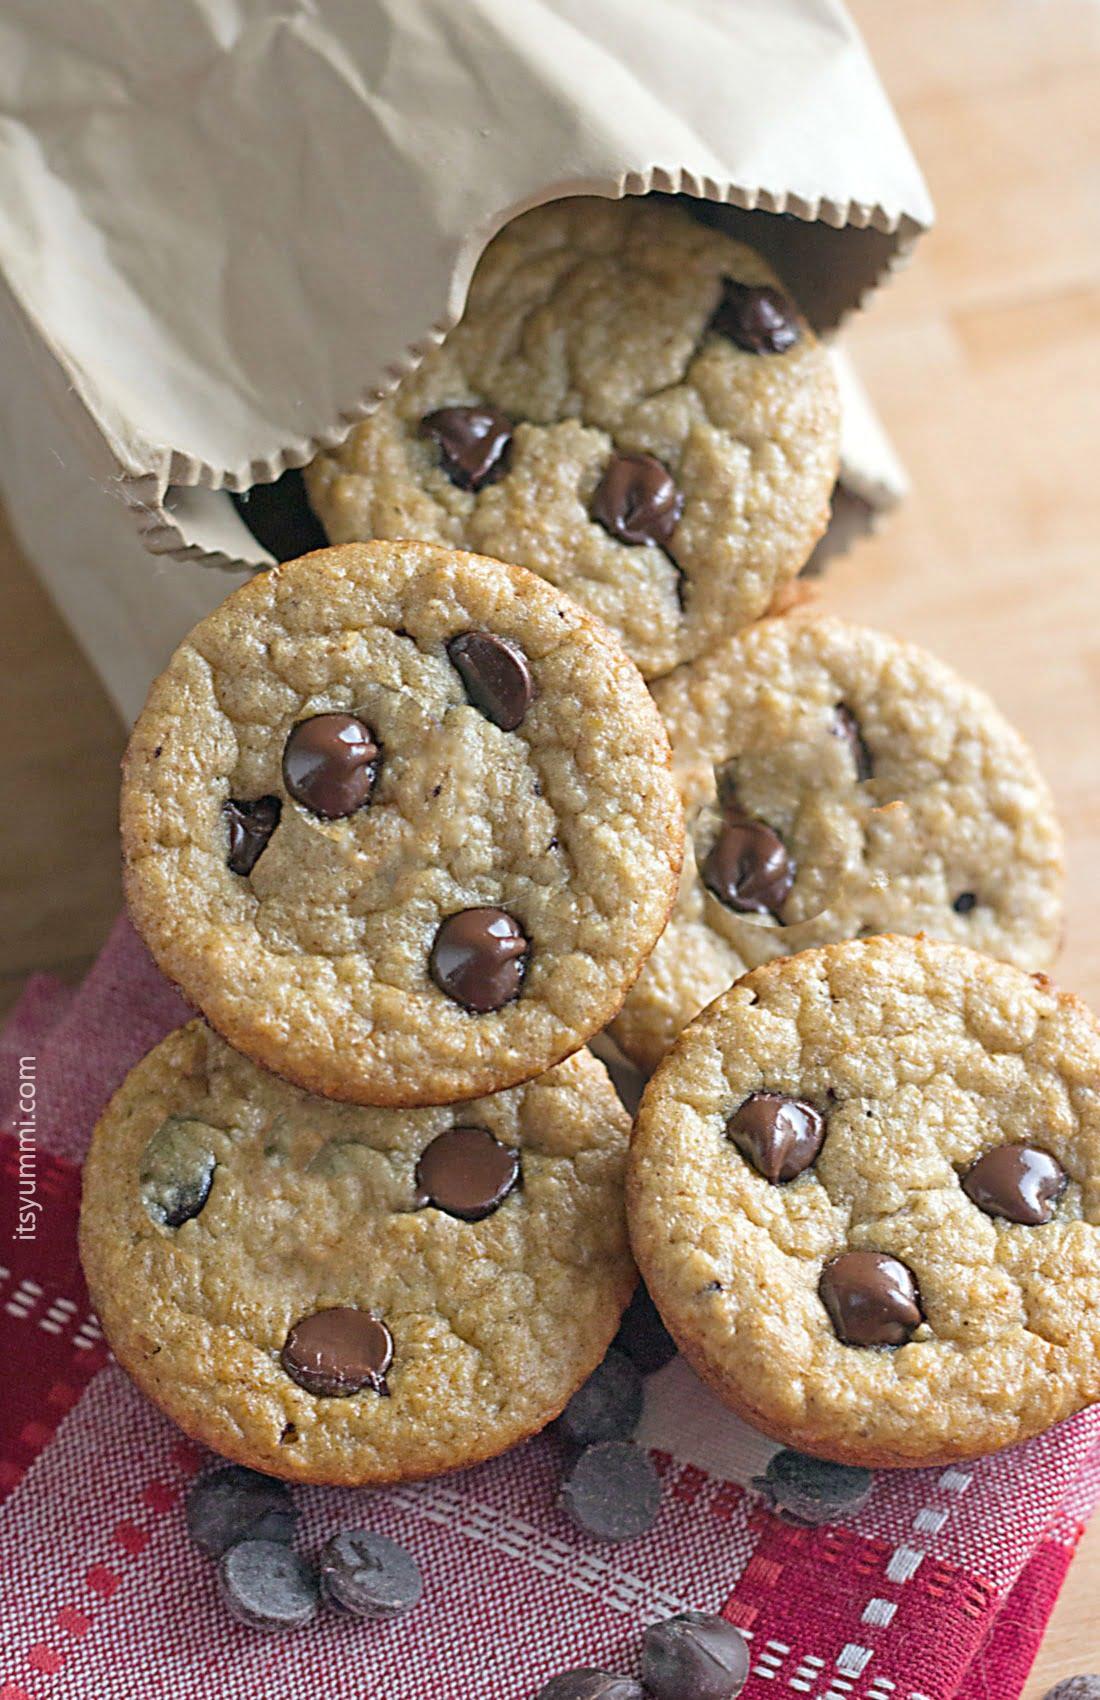 Chocolate Chip Banana Blender Muffins ⋆ Its Yummi